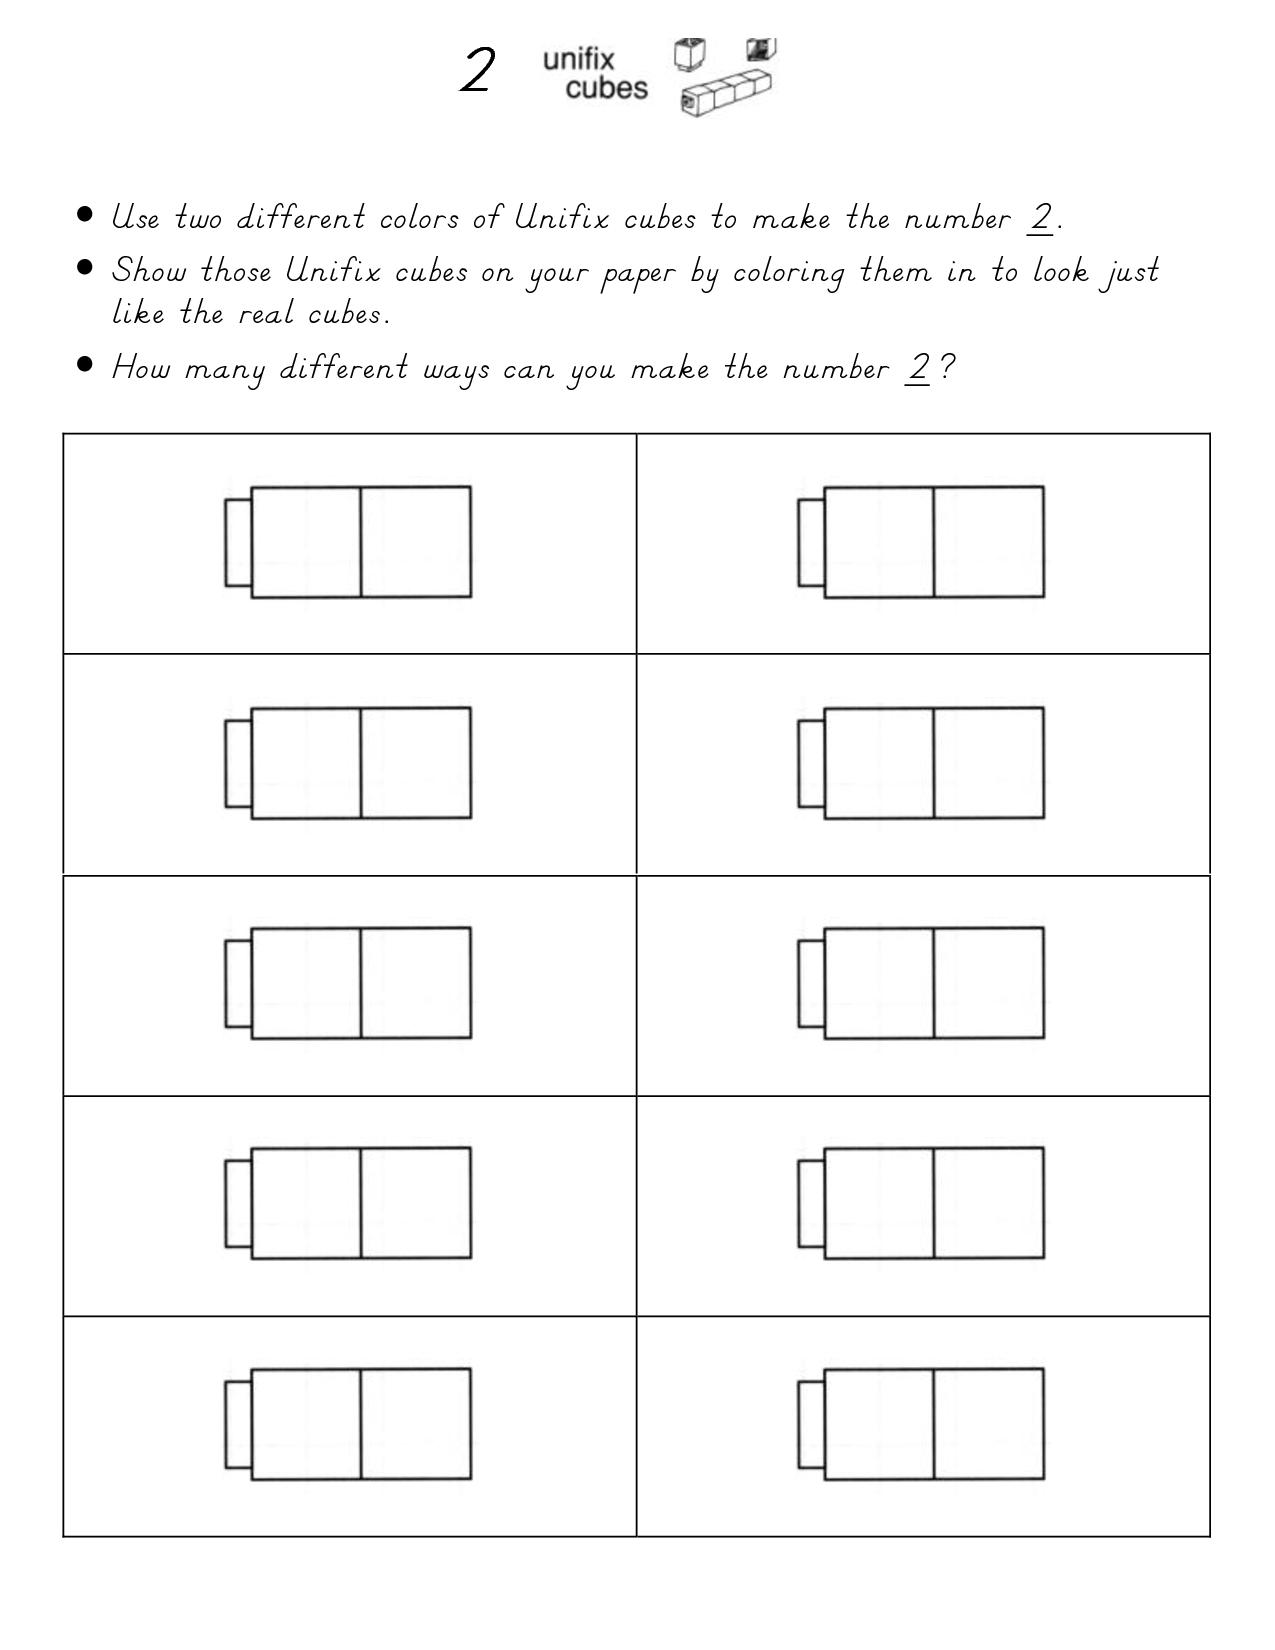 Unifix Cube Sheets 1